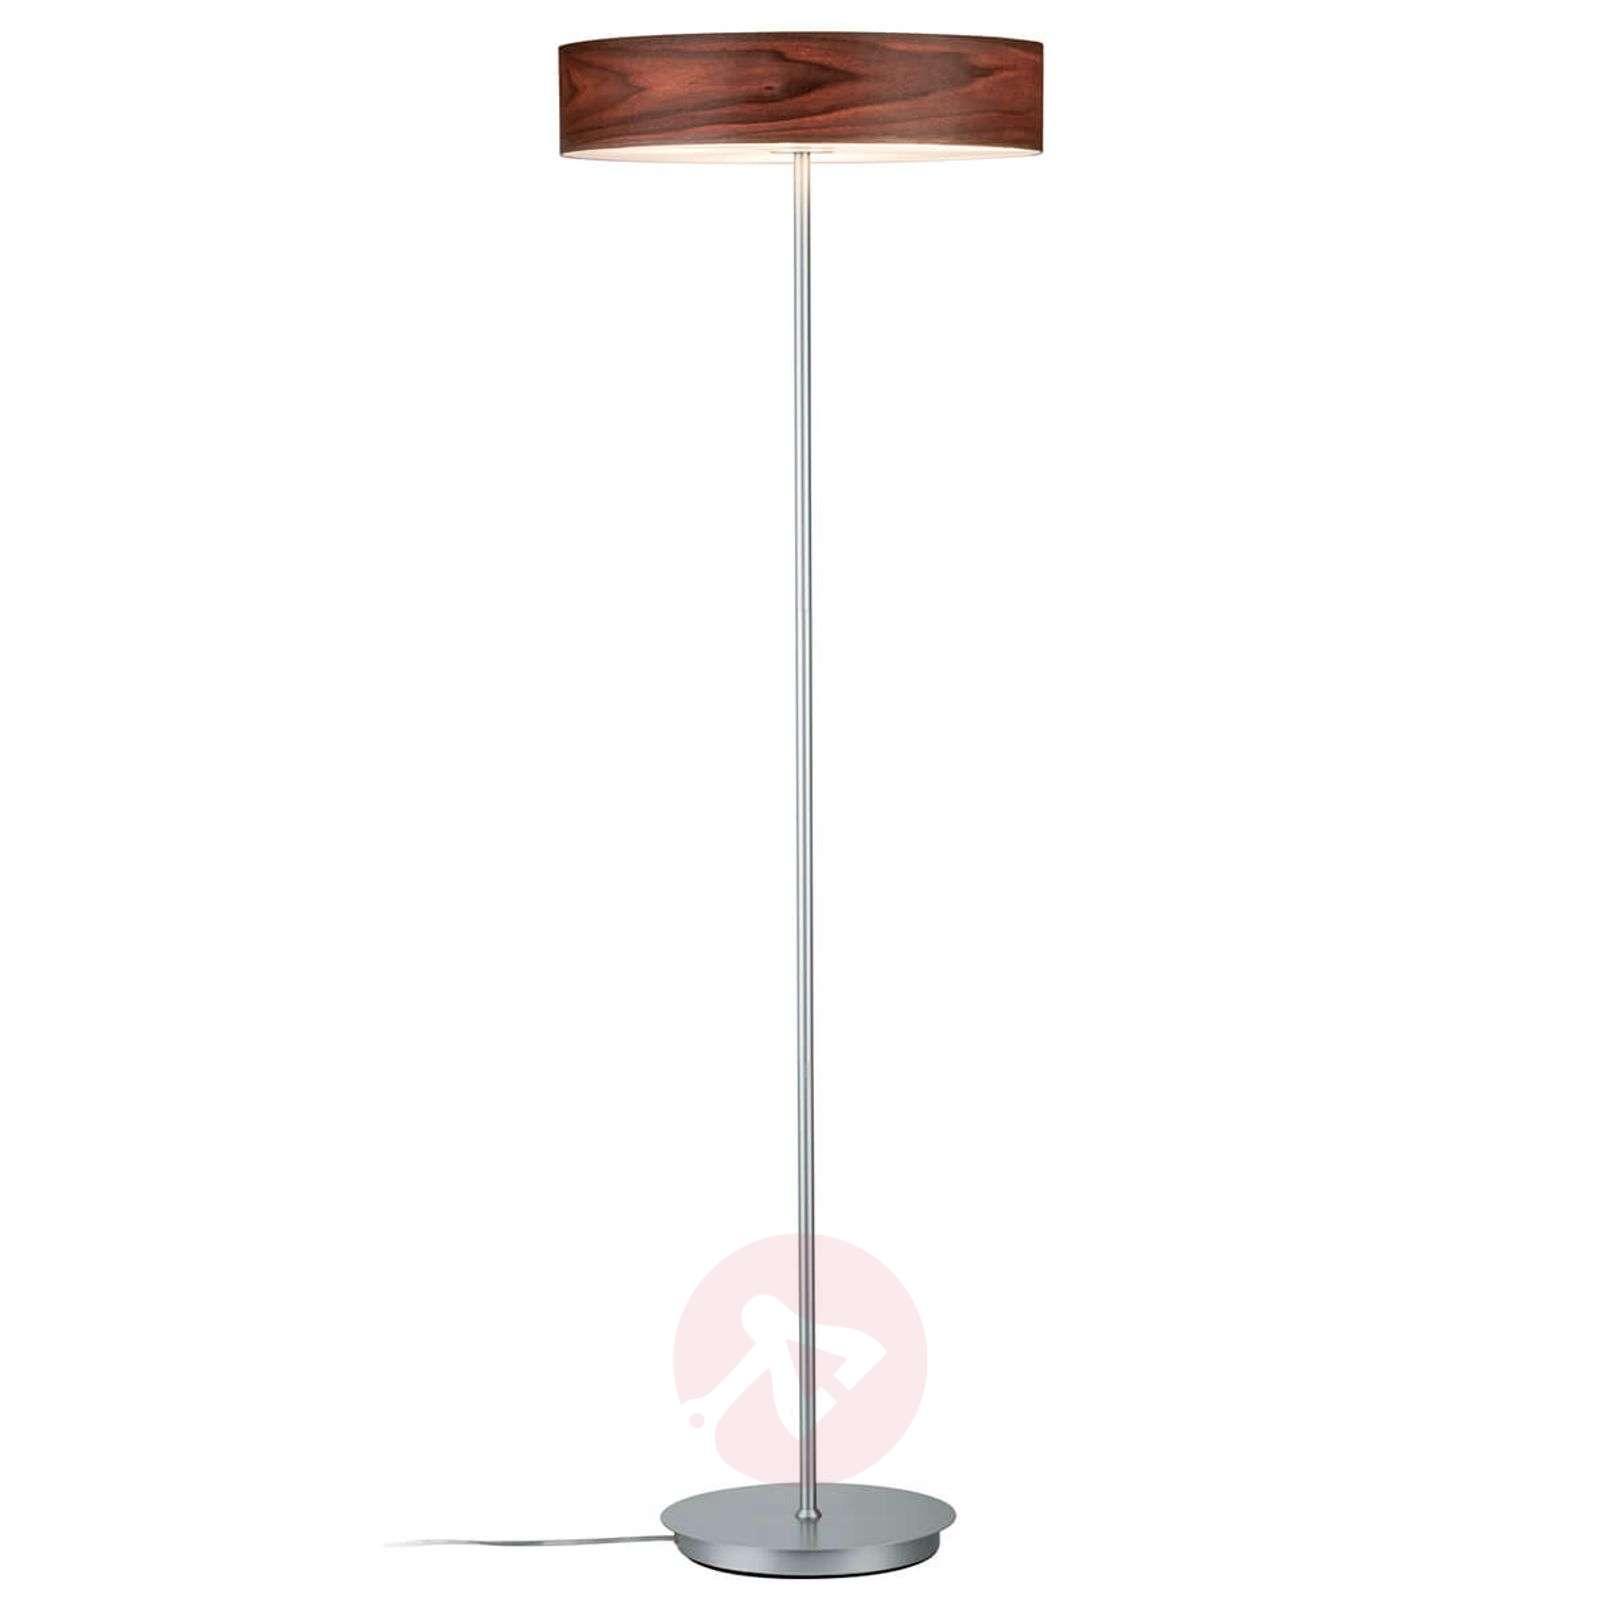 Moderni Liska-lattiavalaisin, puuvarjostin-7601065-01